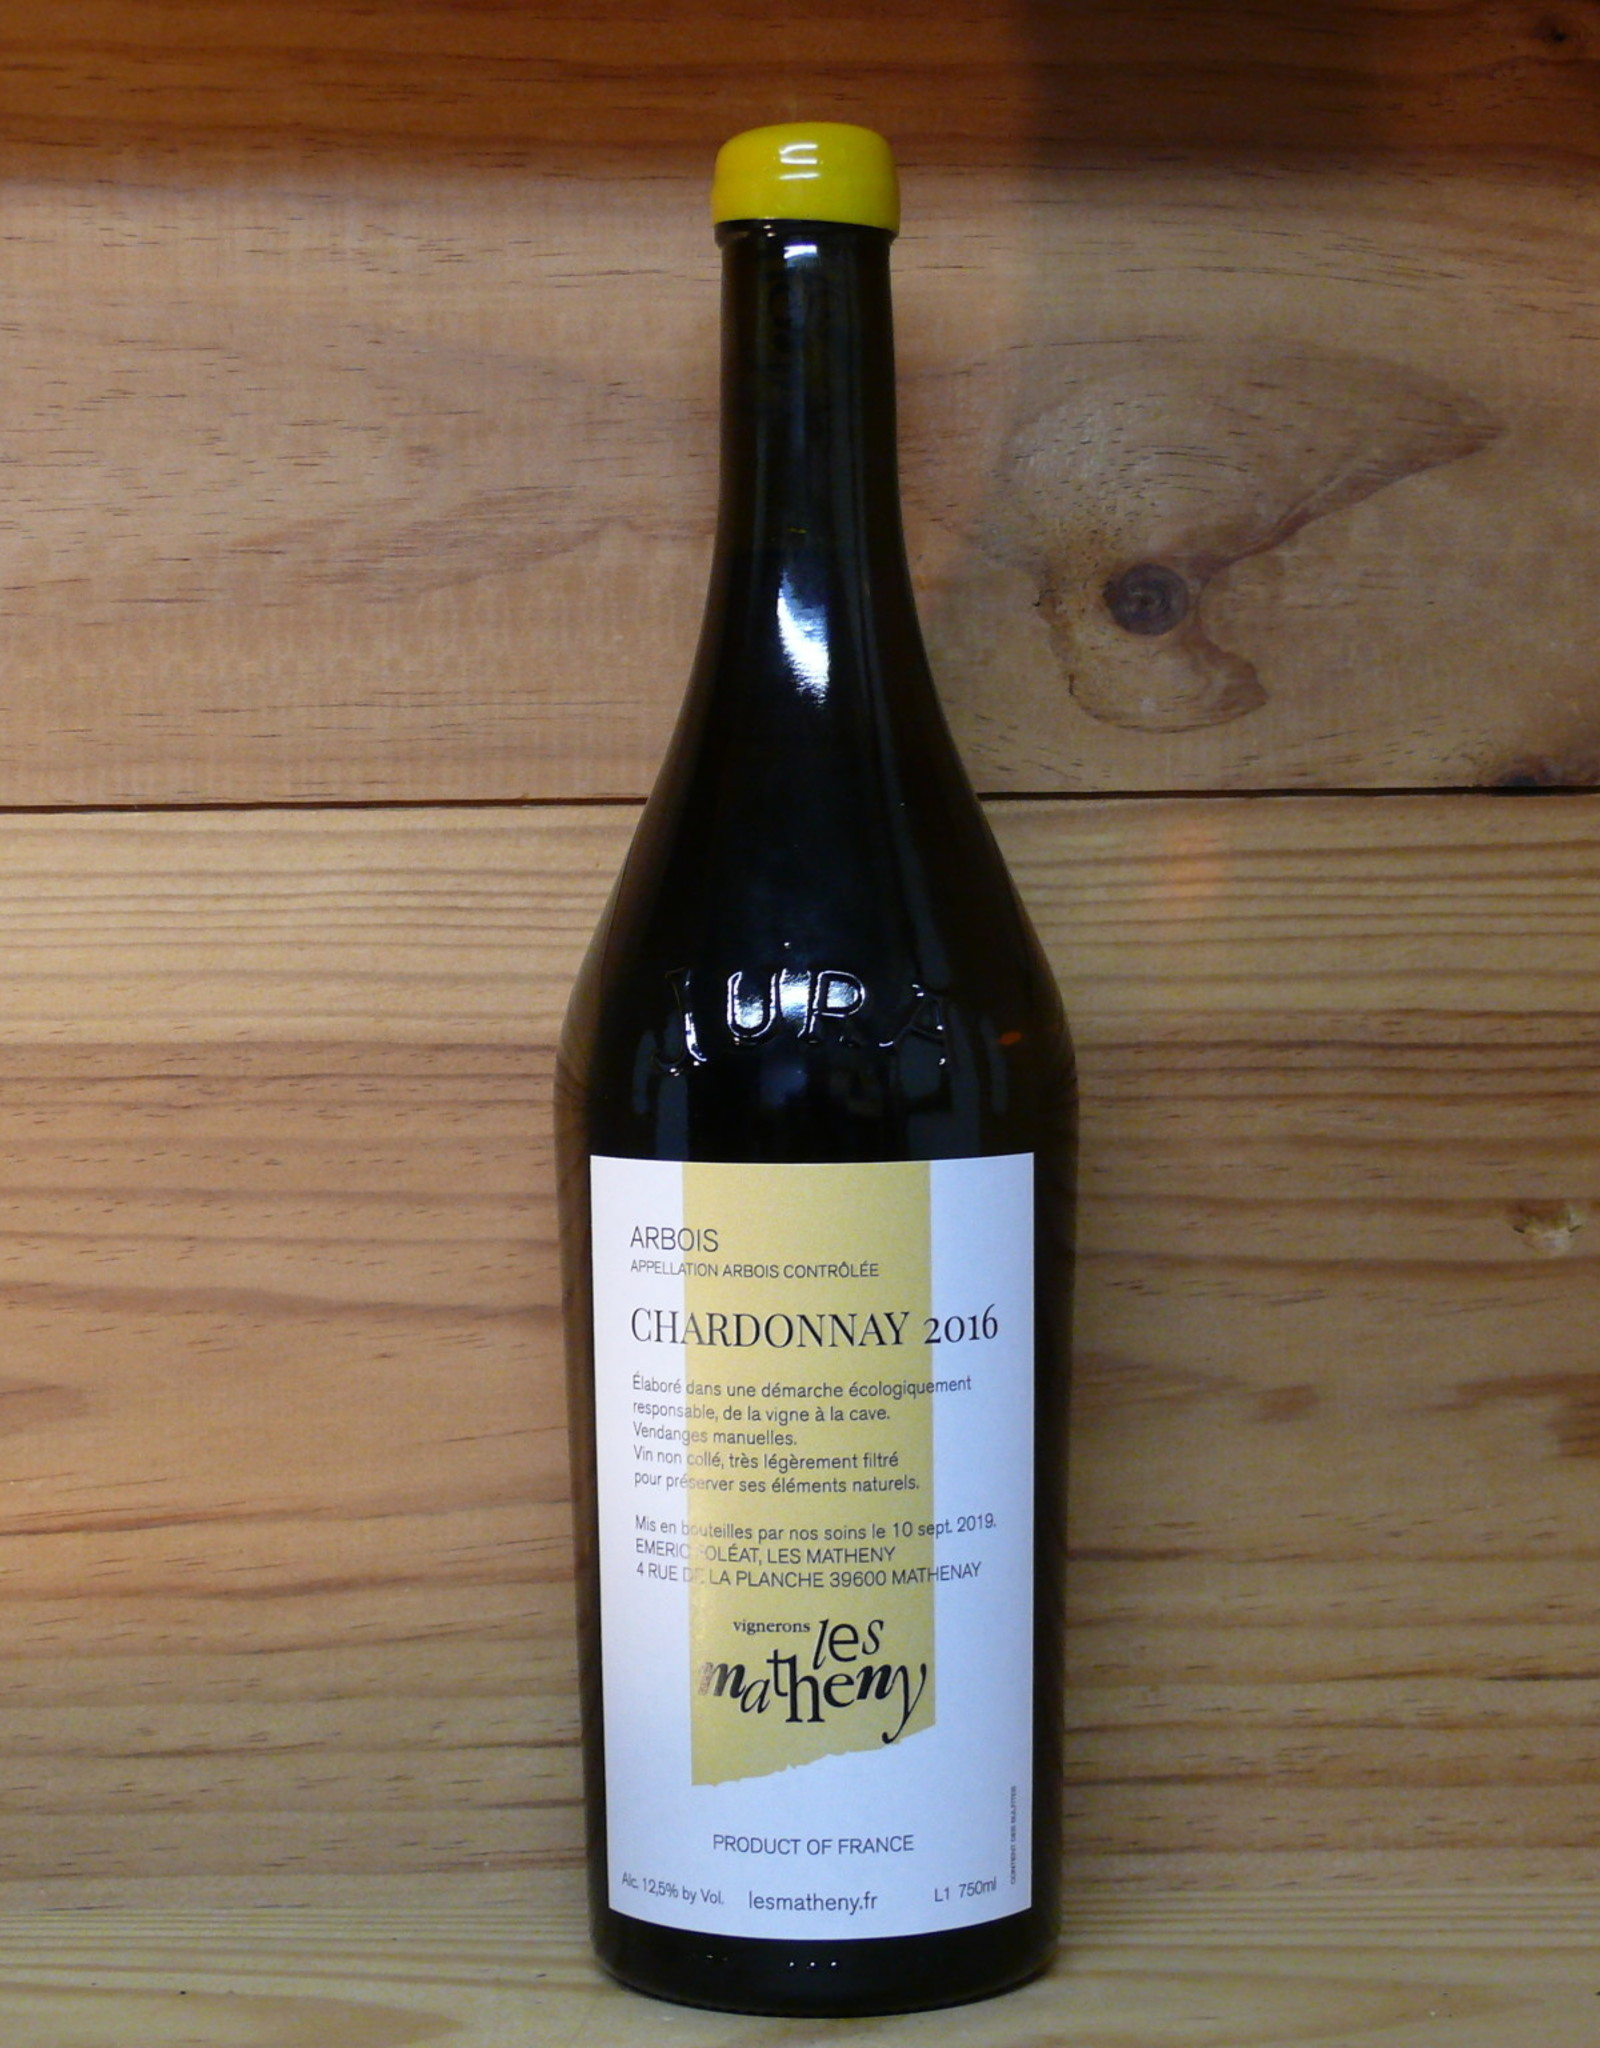 Les Matheny - Arbois Chardonnay 2016